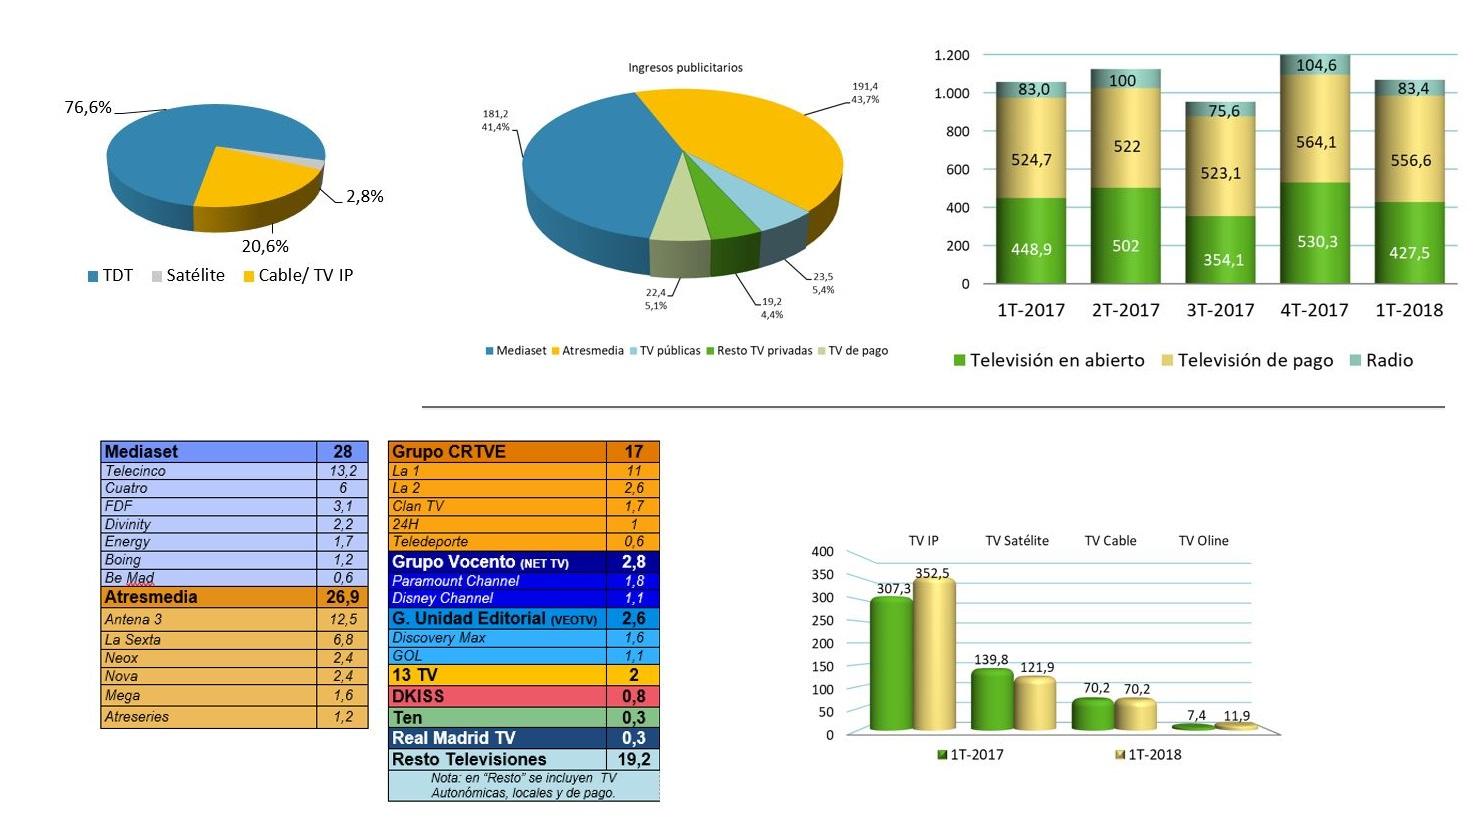 http://www.programapublicidad.com/wp-content/uploads/2018/11/tv-en-abierto-cnmc-data-muy-grande.jpg